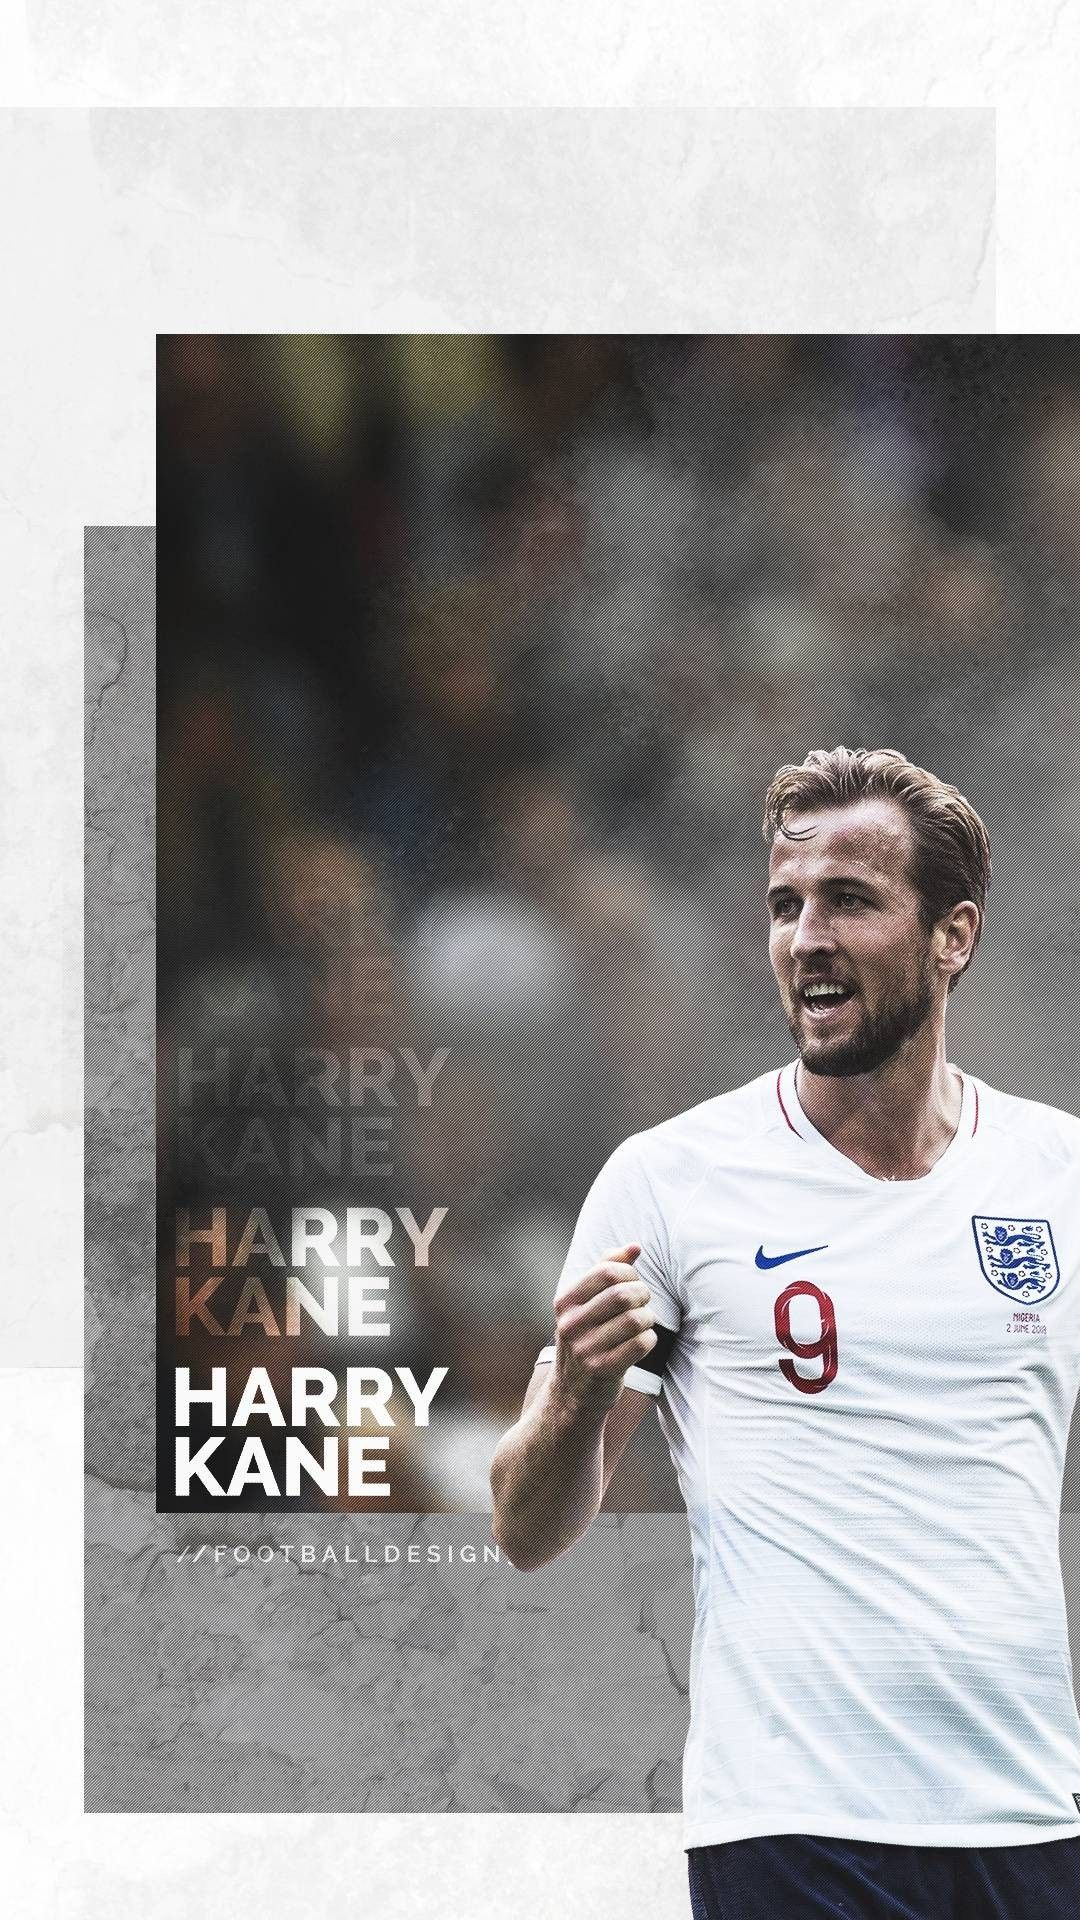 Harry Kane England Team Wallpaper Harry Kane England Football Team Harry Kane Wallpapers